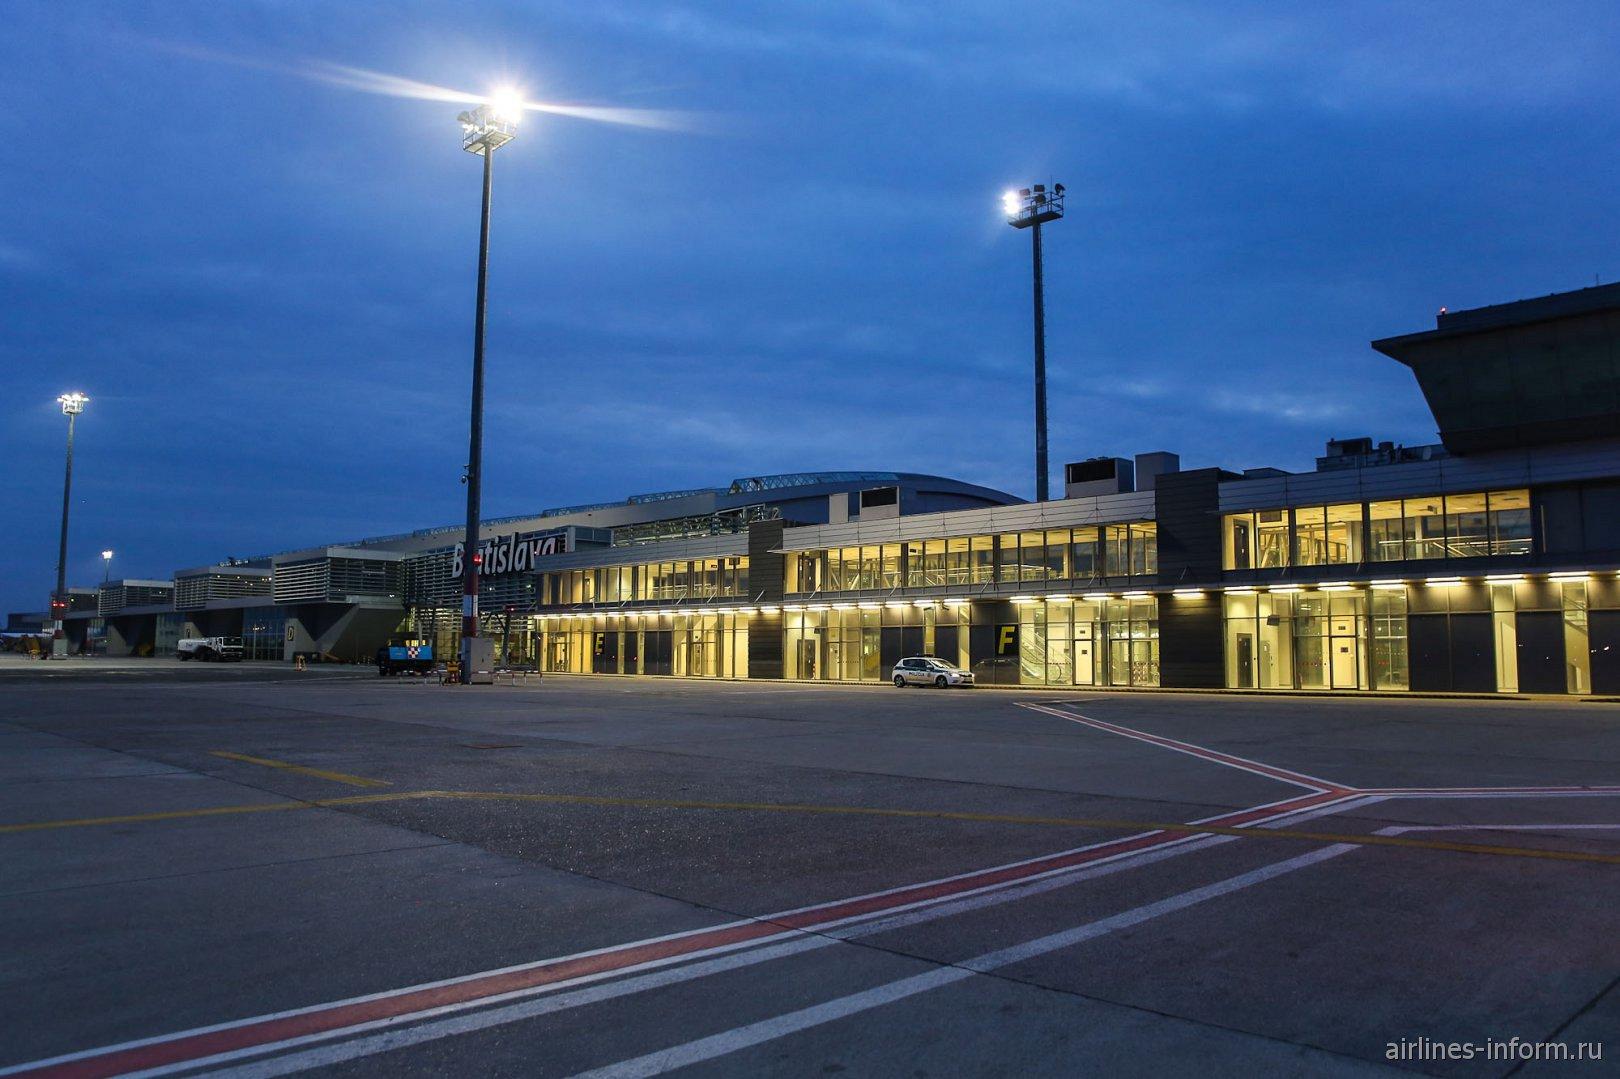 Пассажирский терминал аэропорта Братислава